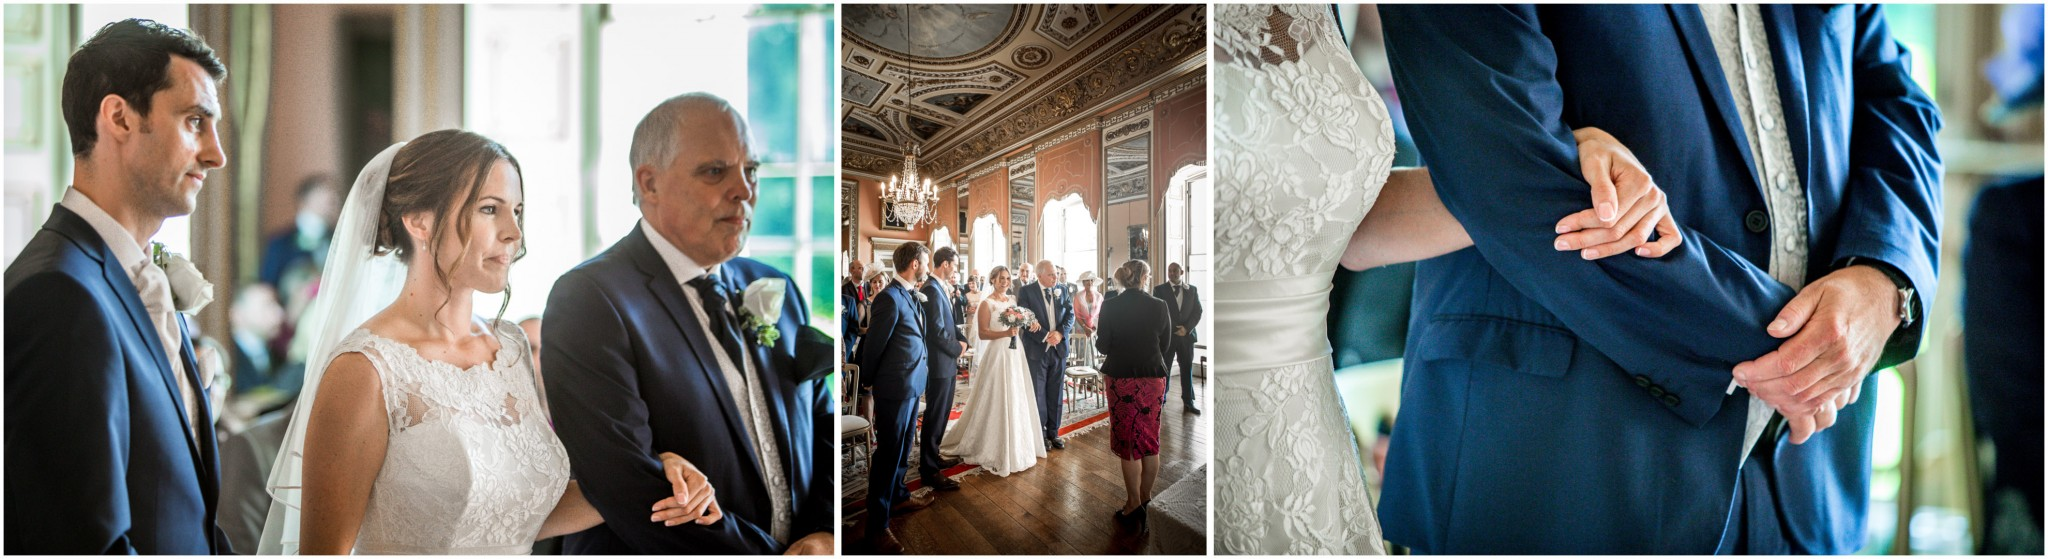 Avington Park Wedding Bride & Groom in ceremony